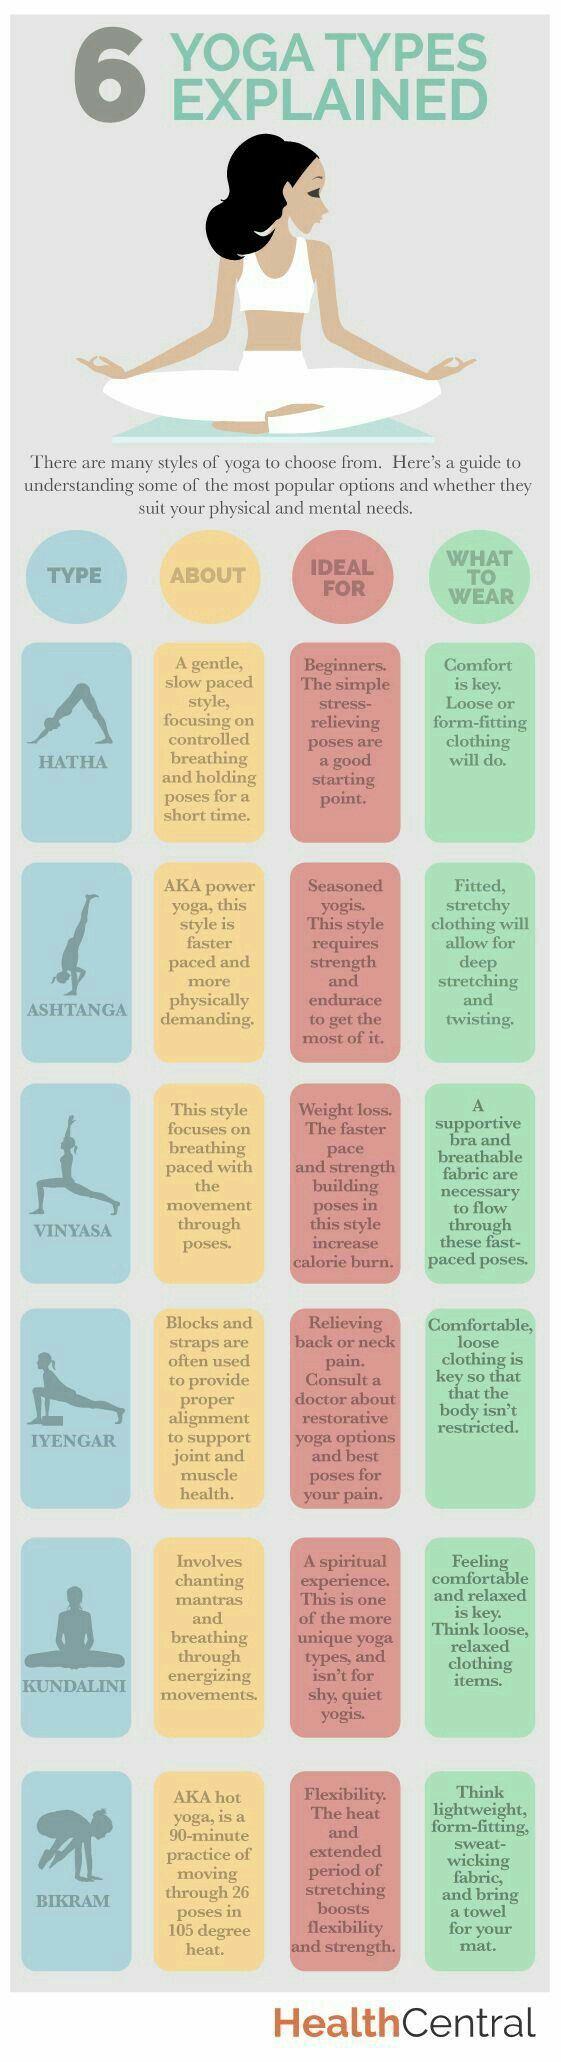 6 yoga types